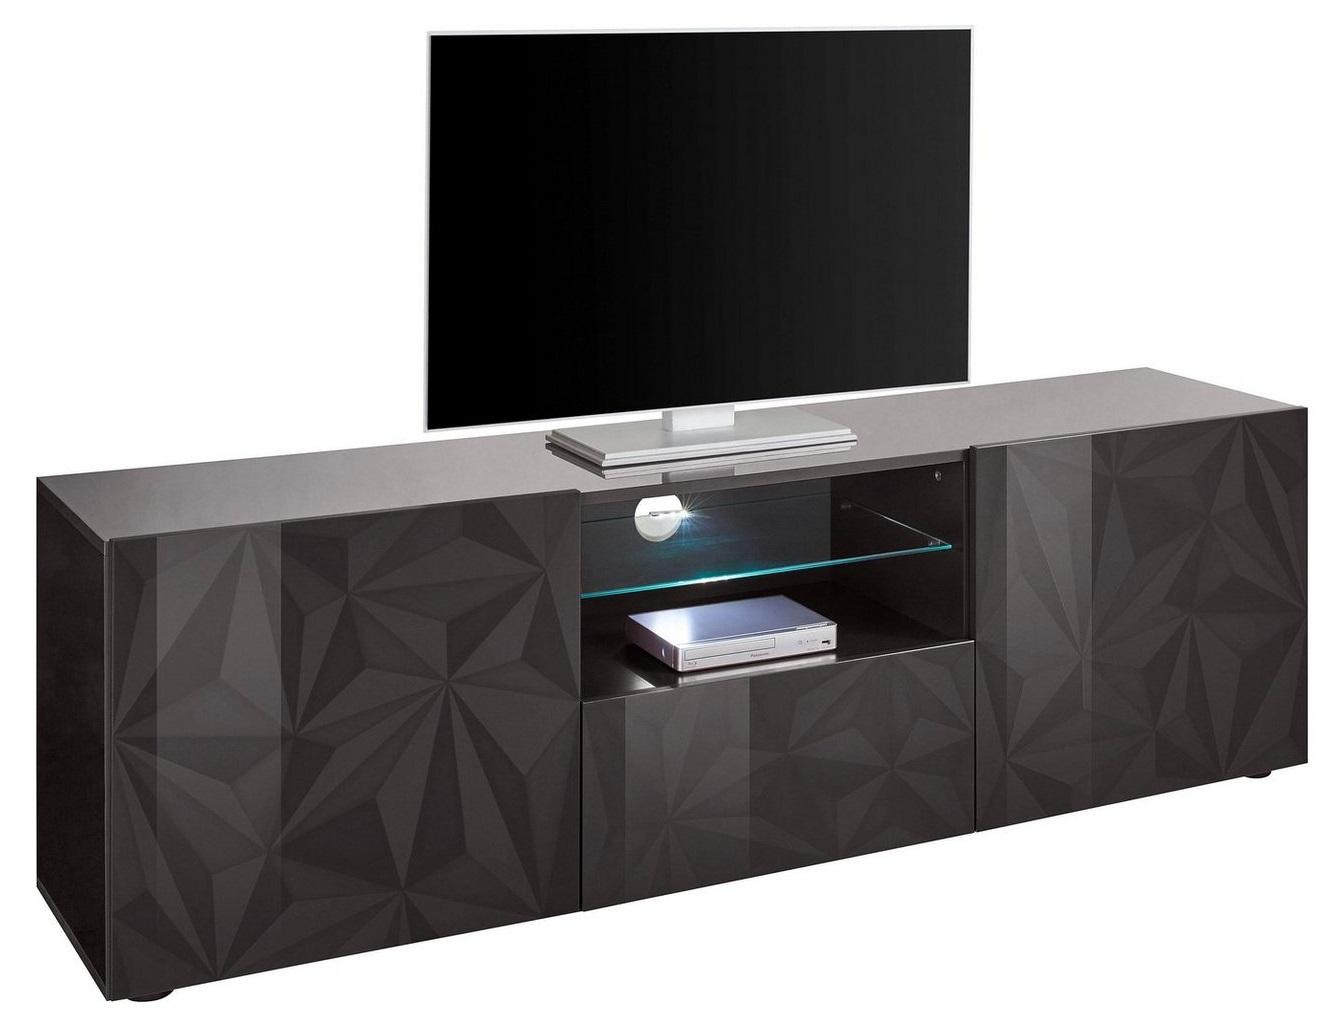 Tv-meubel Kristal 181 cm breed in hoogglans antraciet